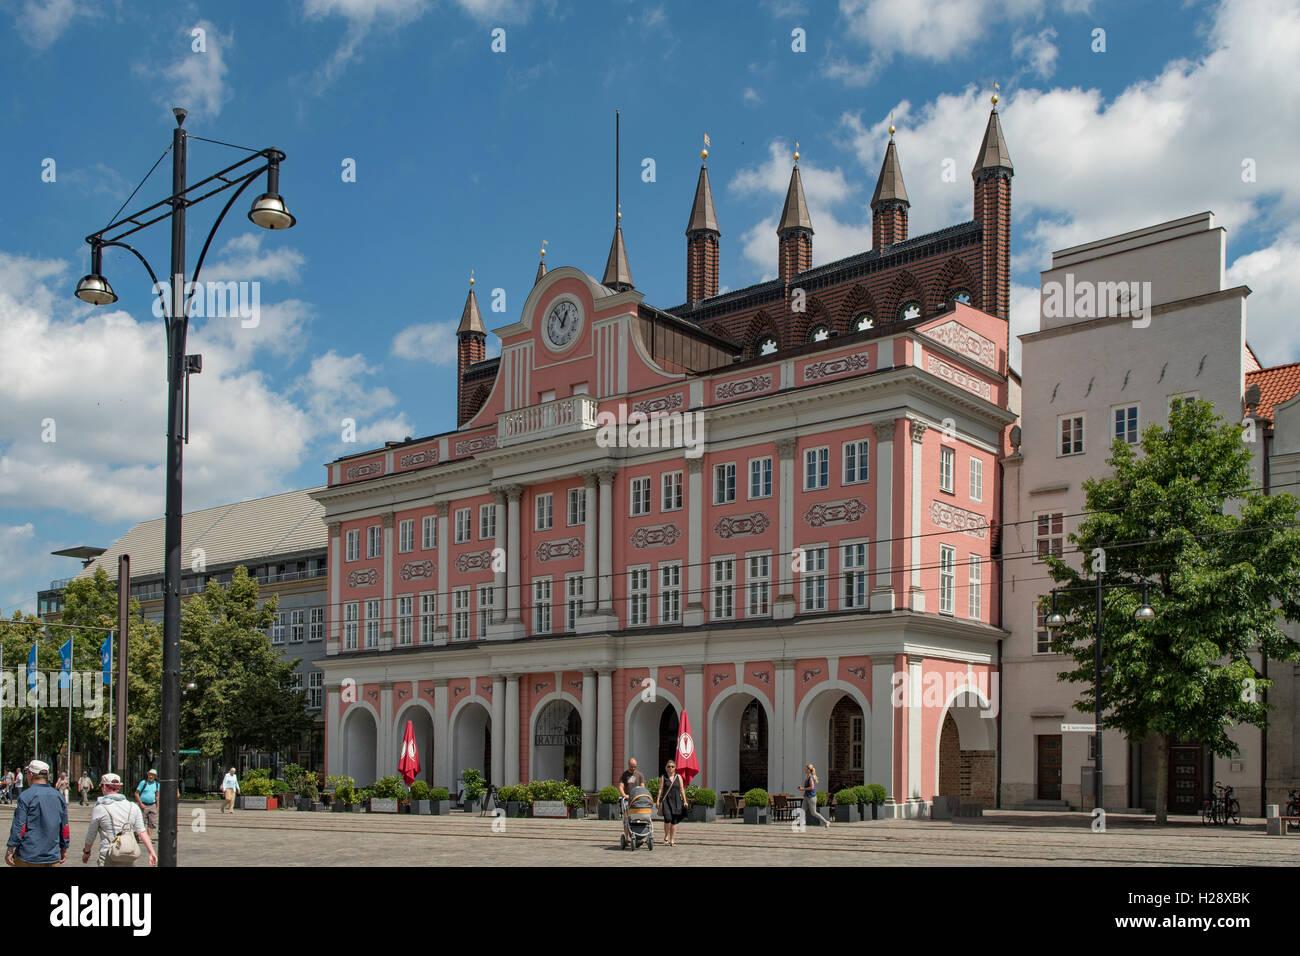 Rathaus, Rostock, Mecklenburg-Vorpommern, Germany - Stock Image